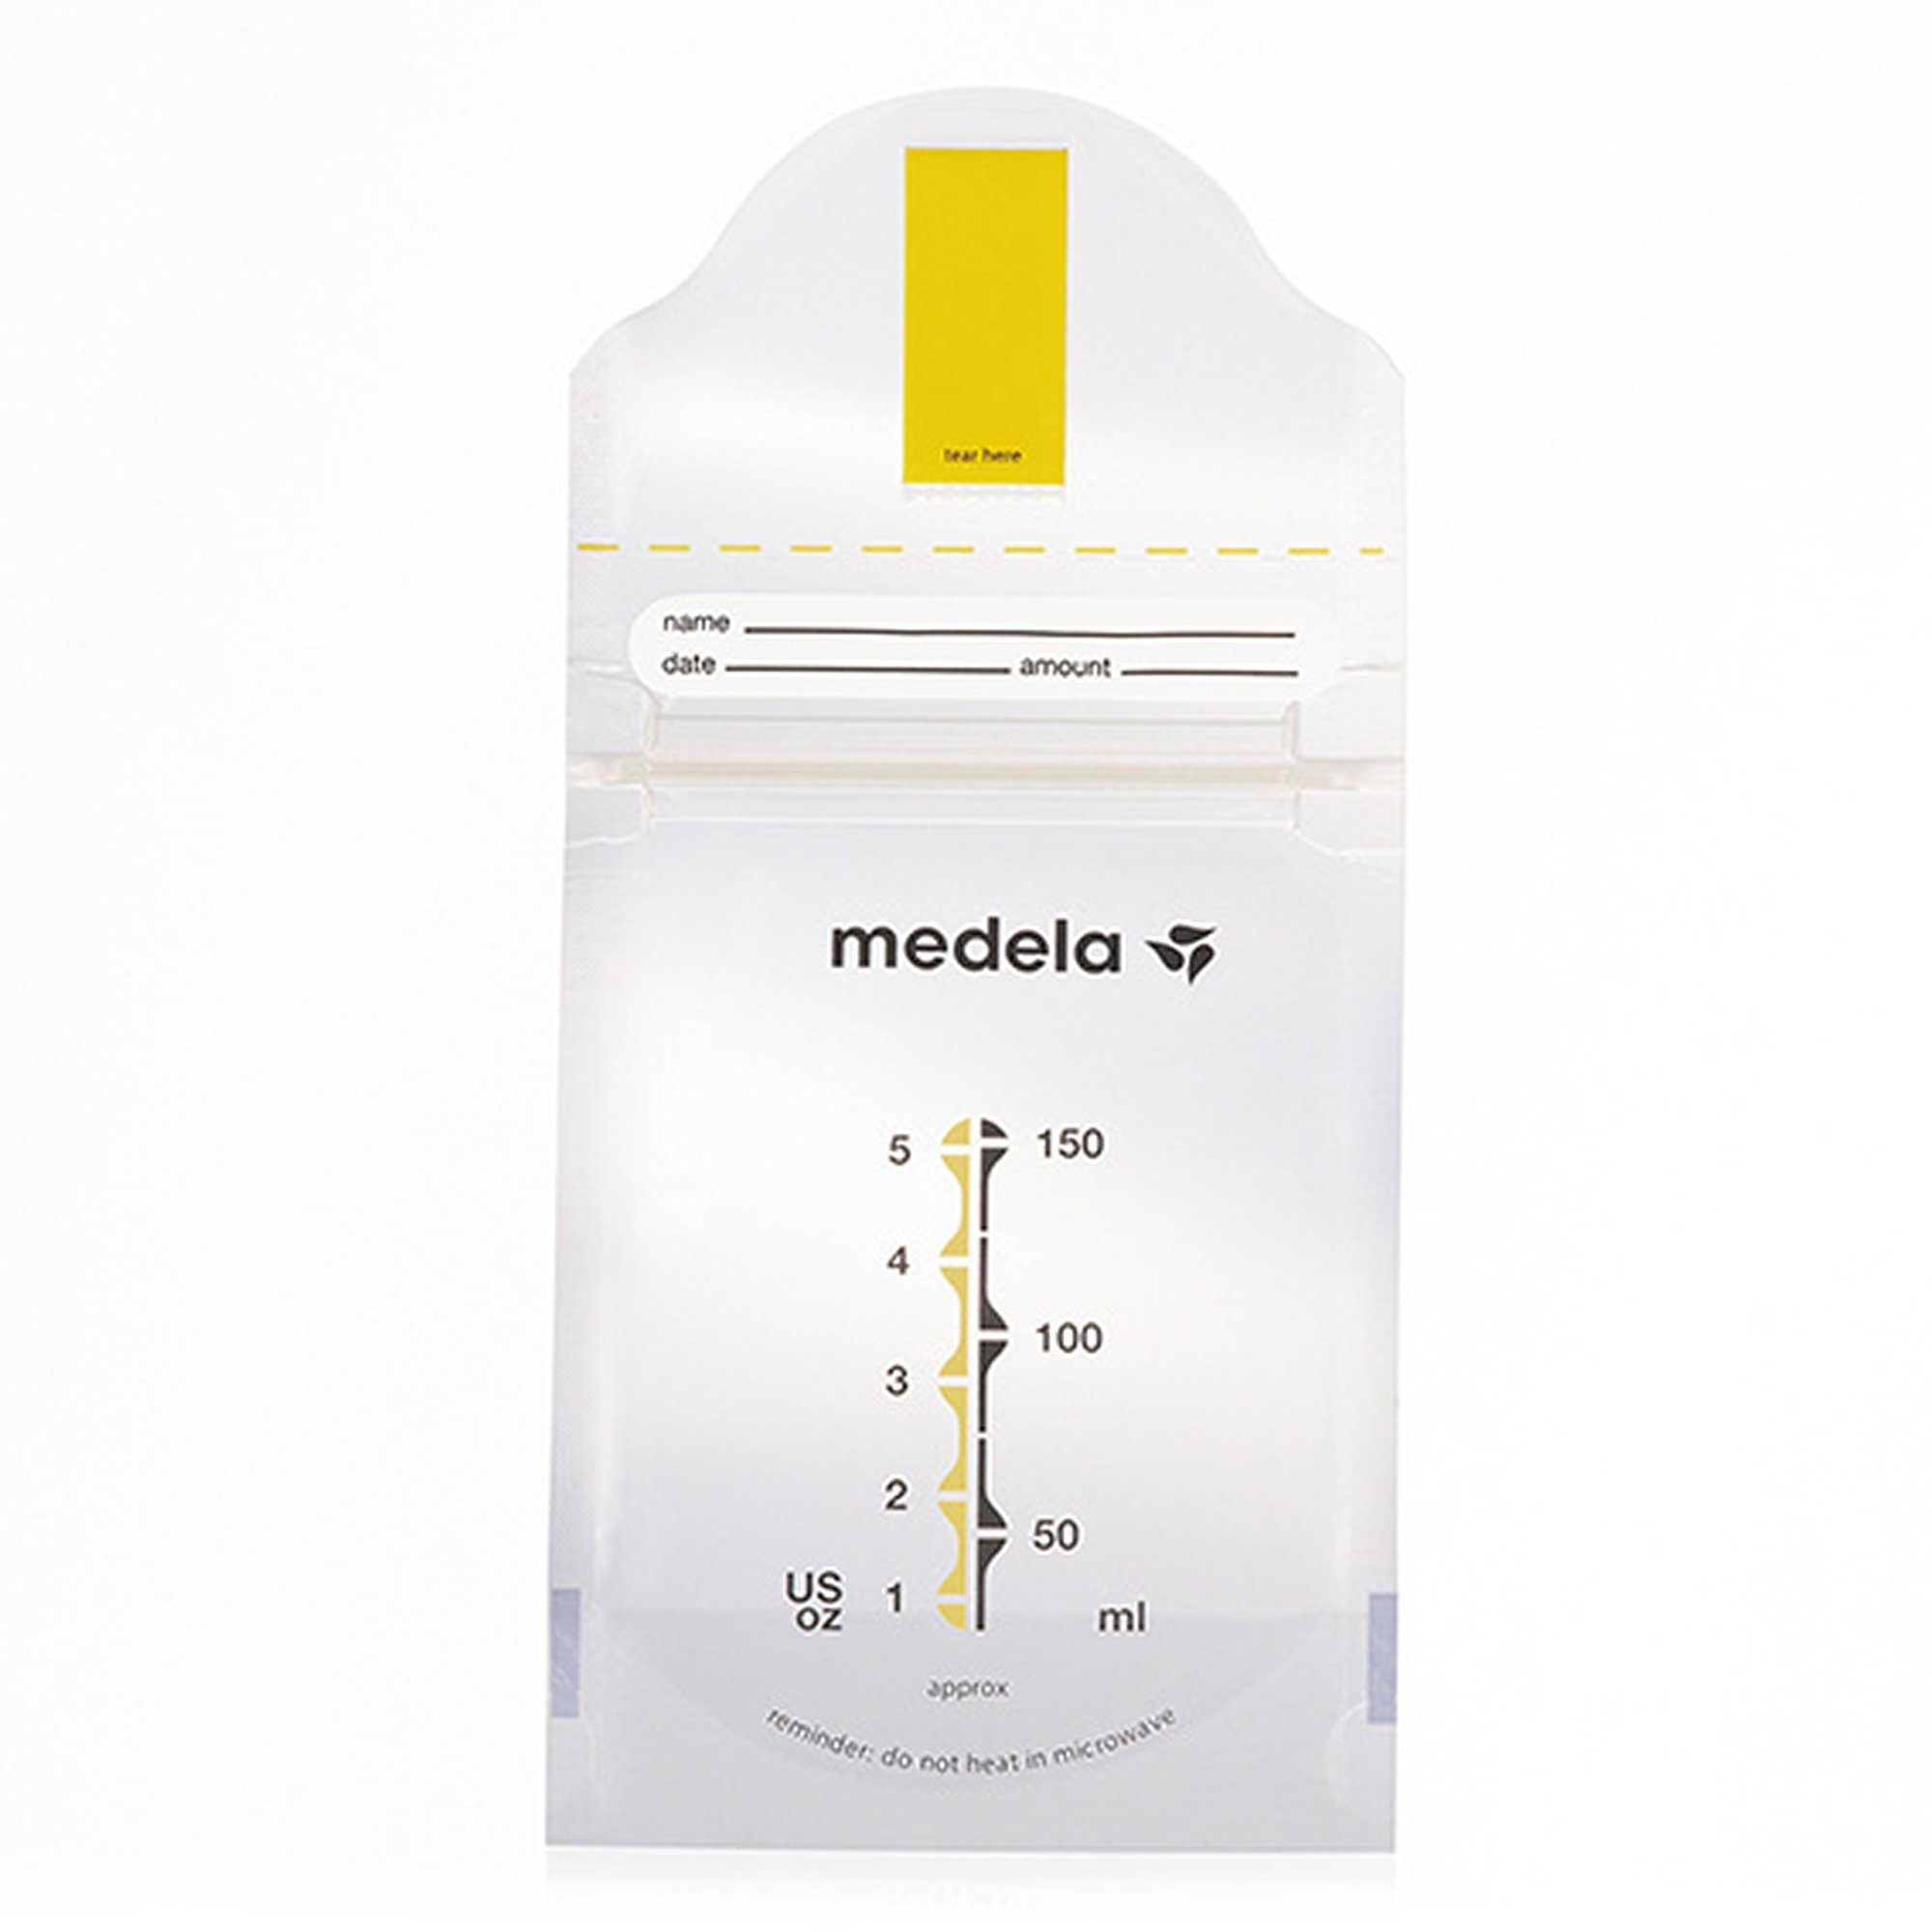 MEDELA 20er-Pack Muttermilch-Beutel Pump & Save 150ml